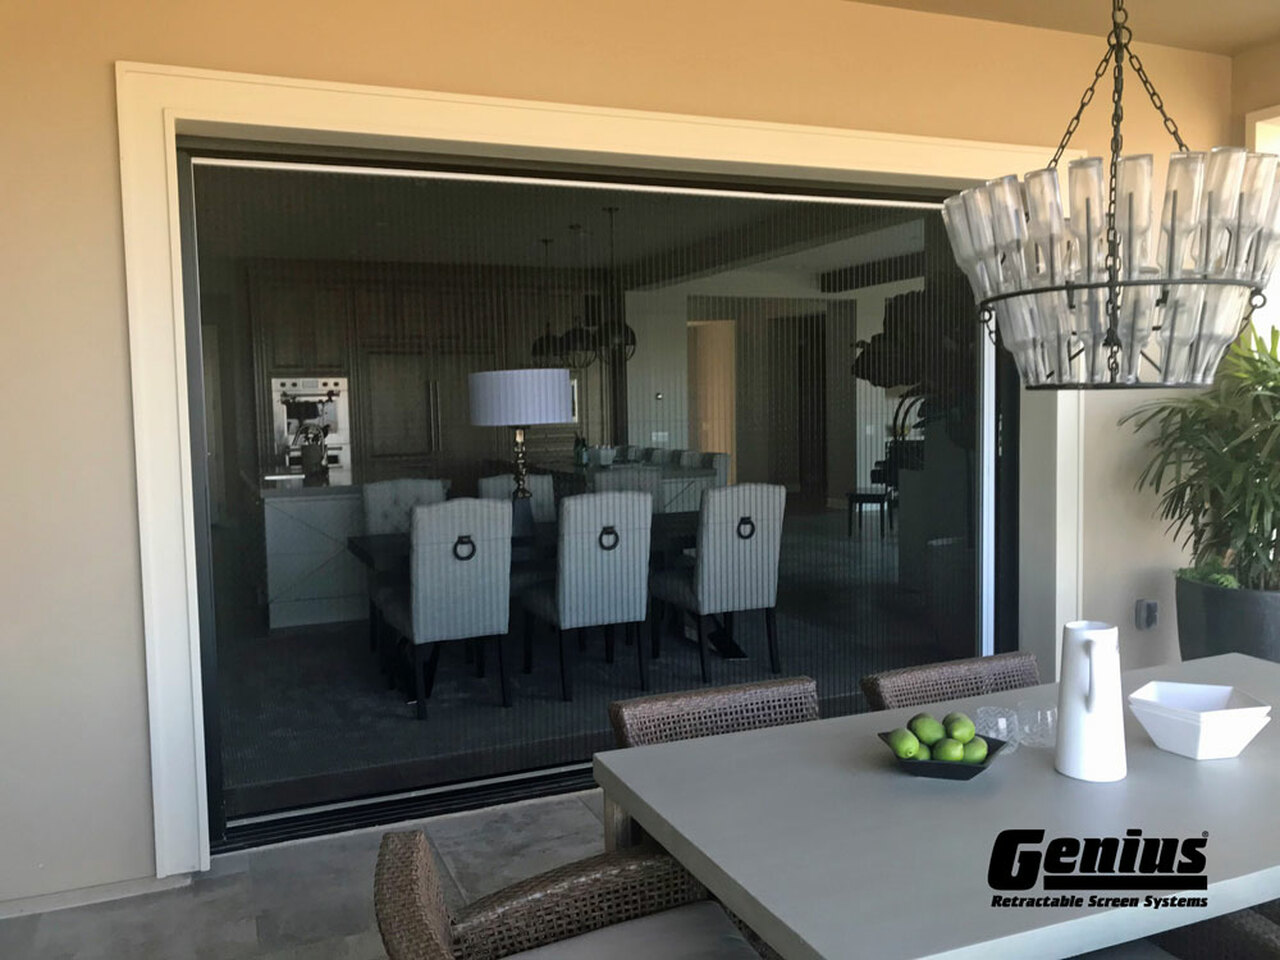 Genius®  ZIGZAG - The Retractable Single Screen Panel